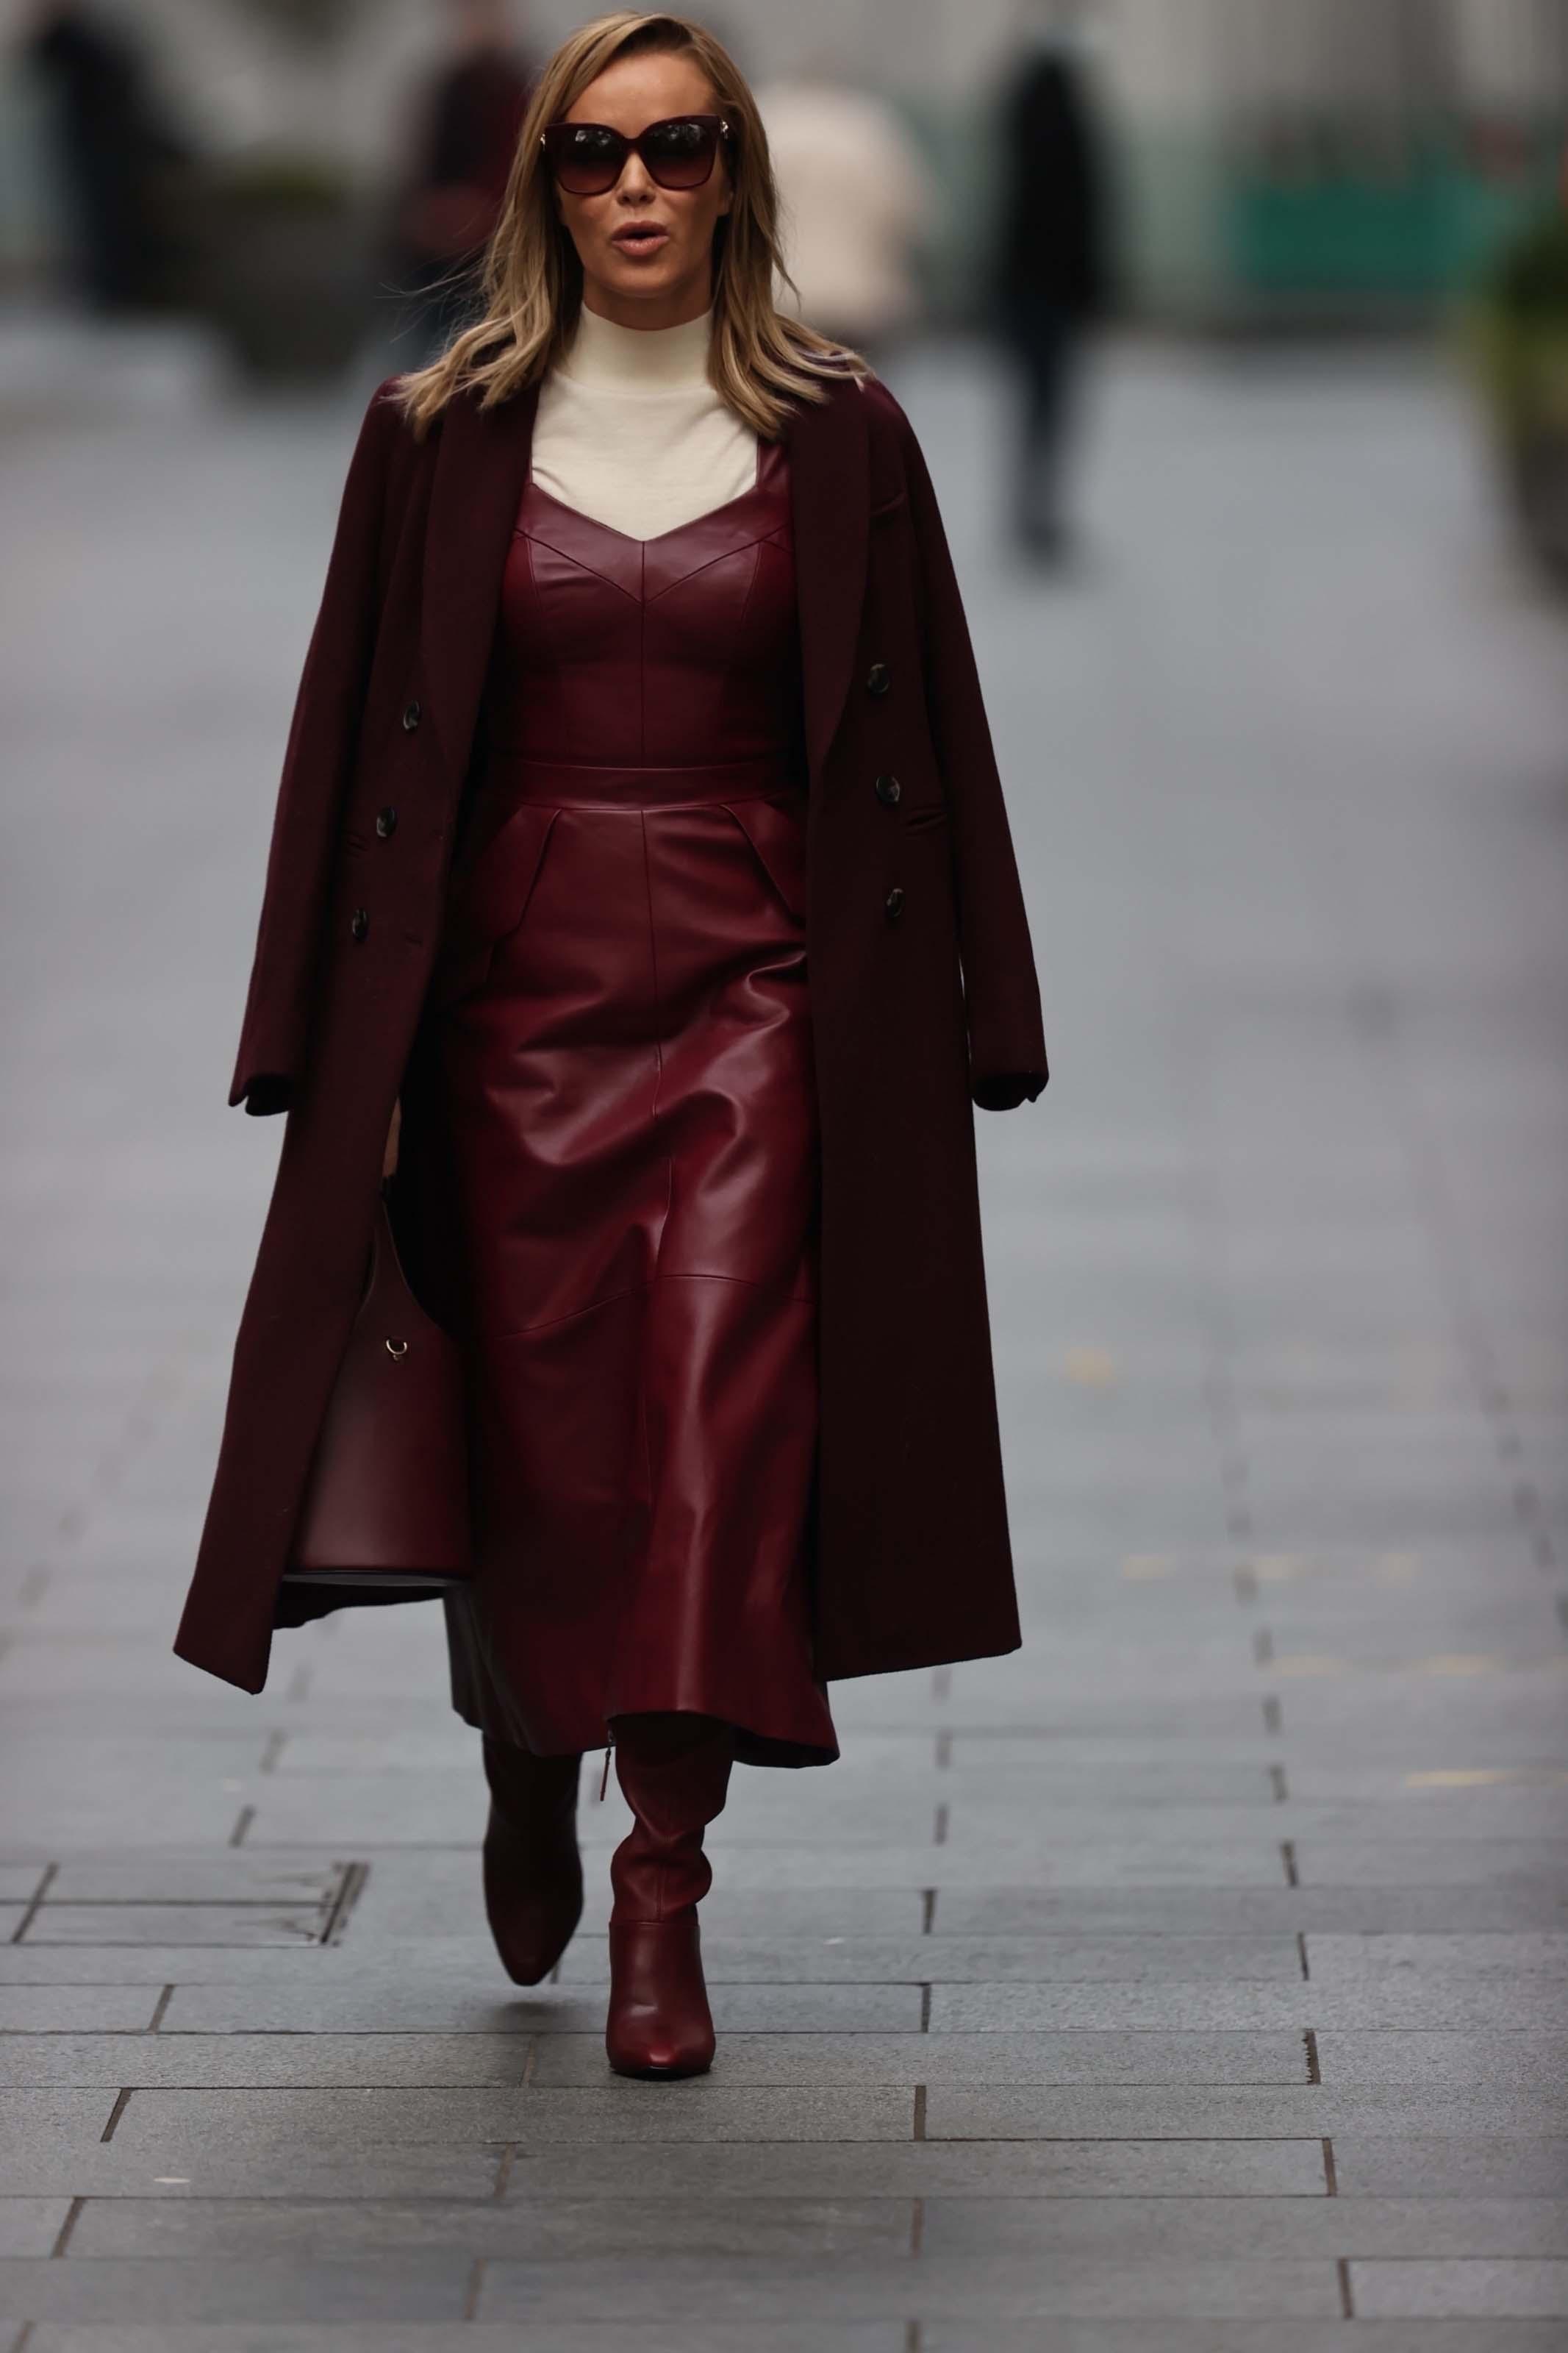 Amanda Holden seen at Global Radio Studios in London